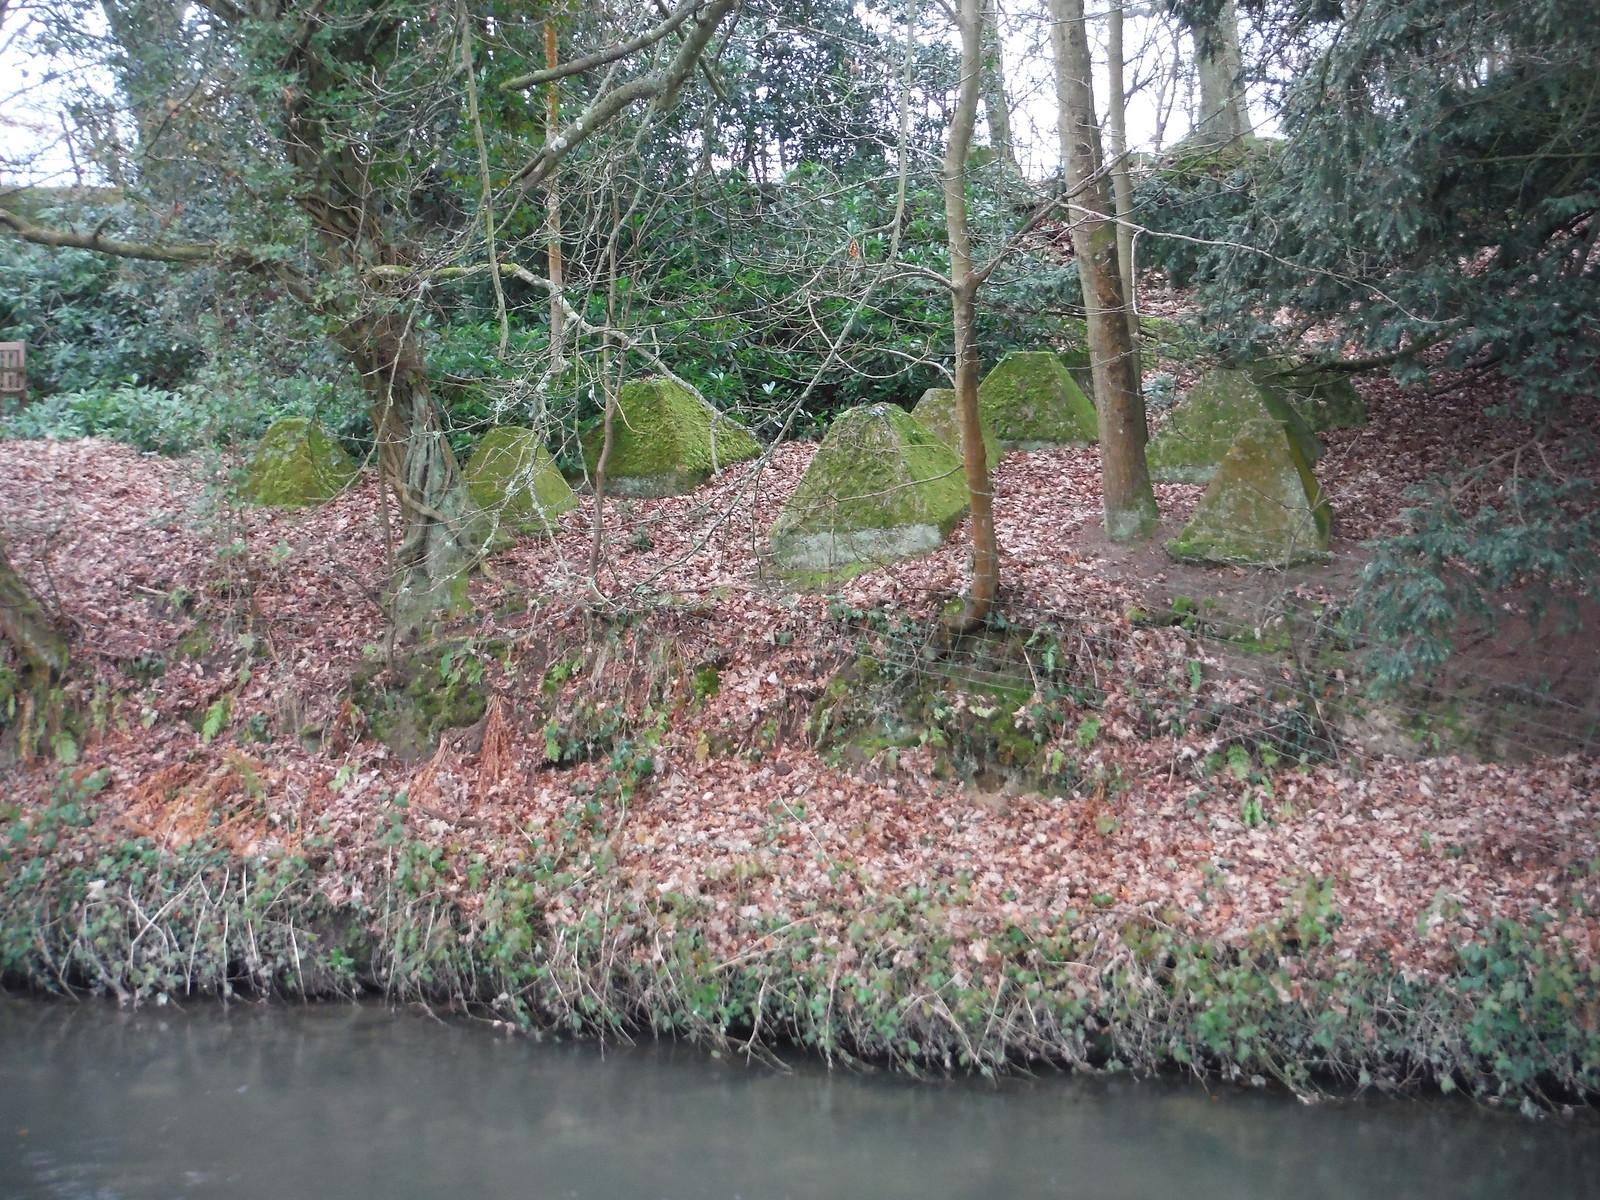 Dragon's Teeth on other side of Wey, Waverley Abbey SWC Walk 144 Haslemere to Farnham - Waverley Abbey Extension